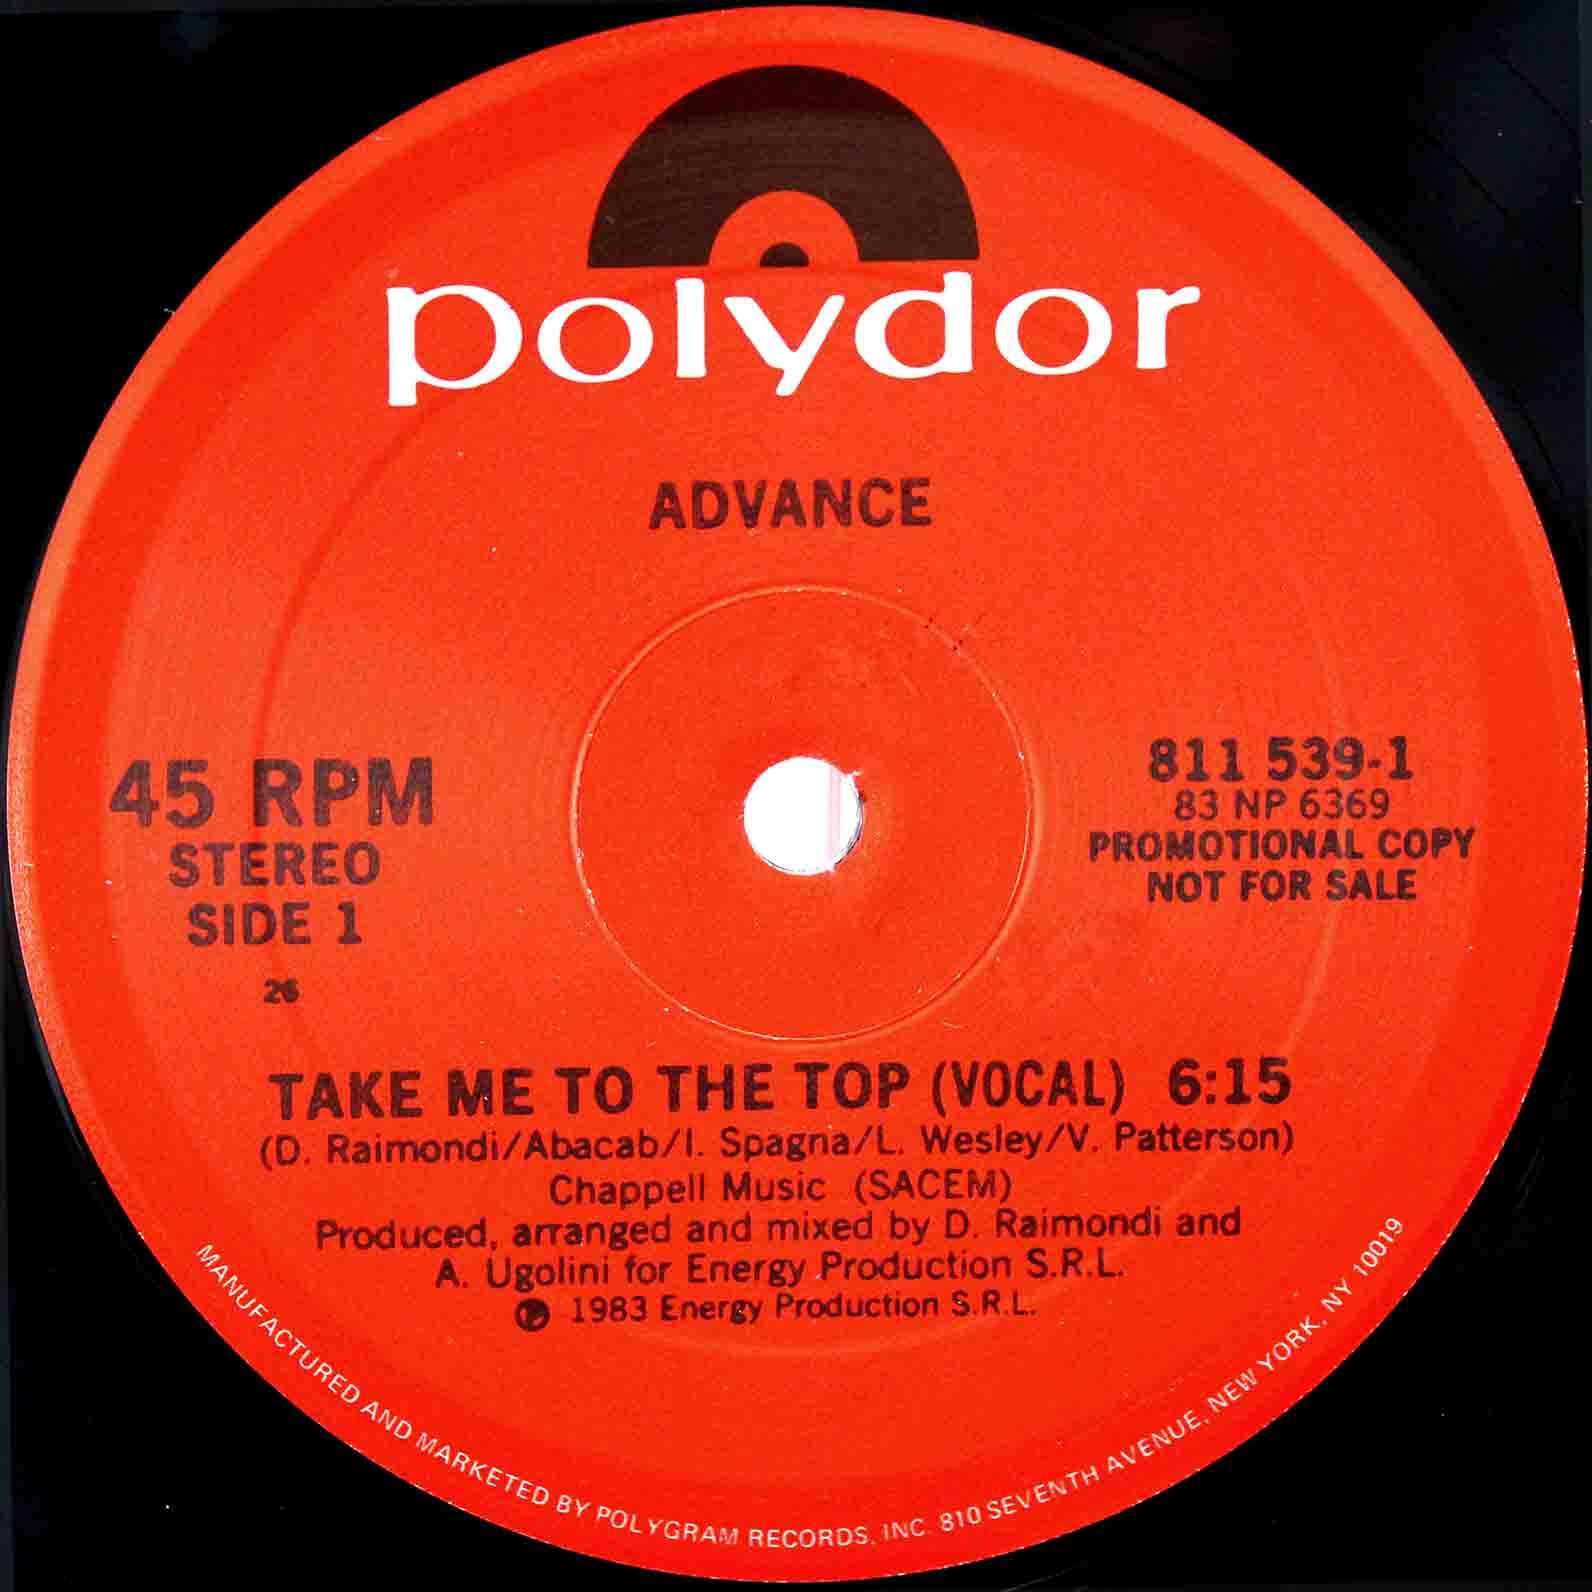 Advance – Take Me To The Top 03